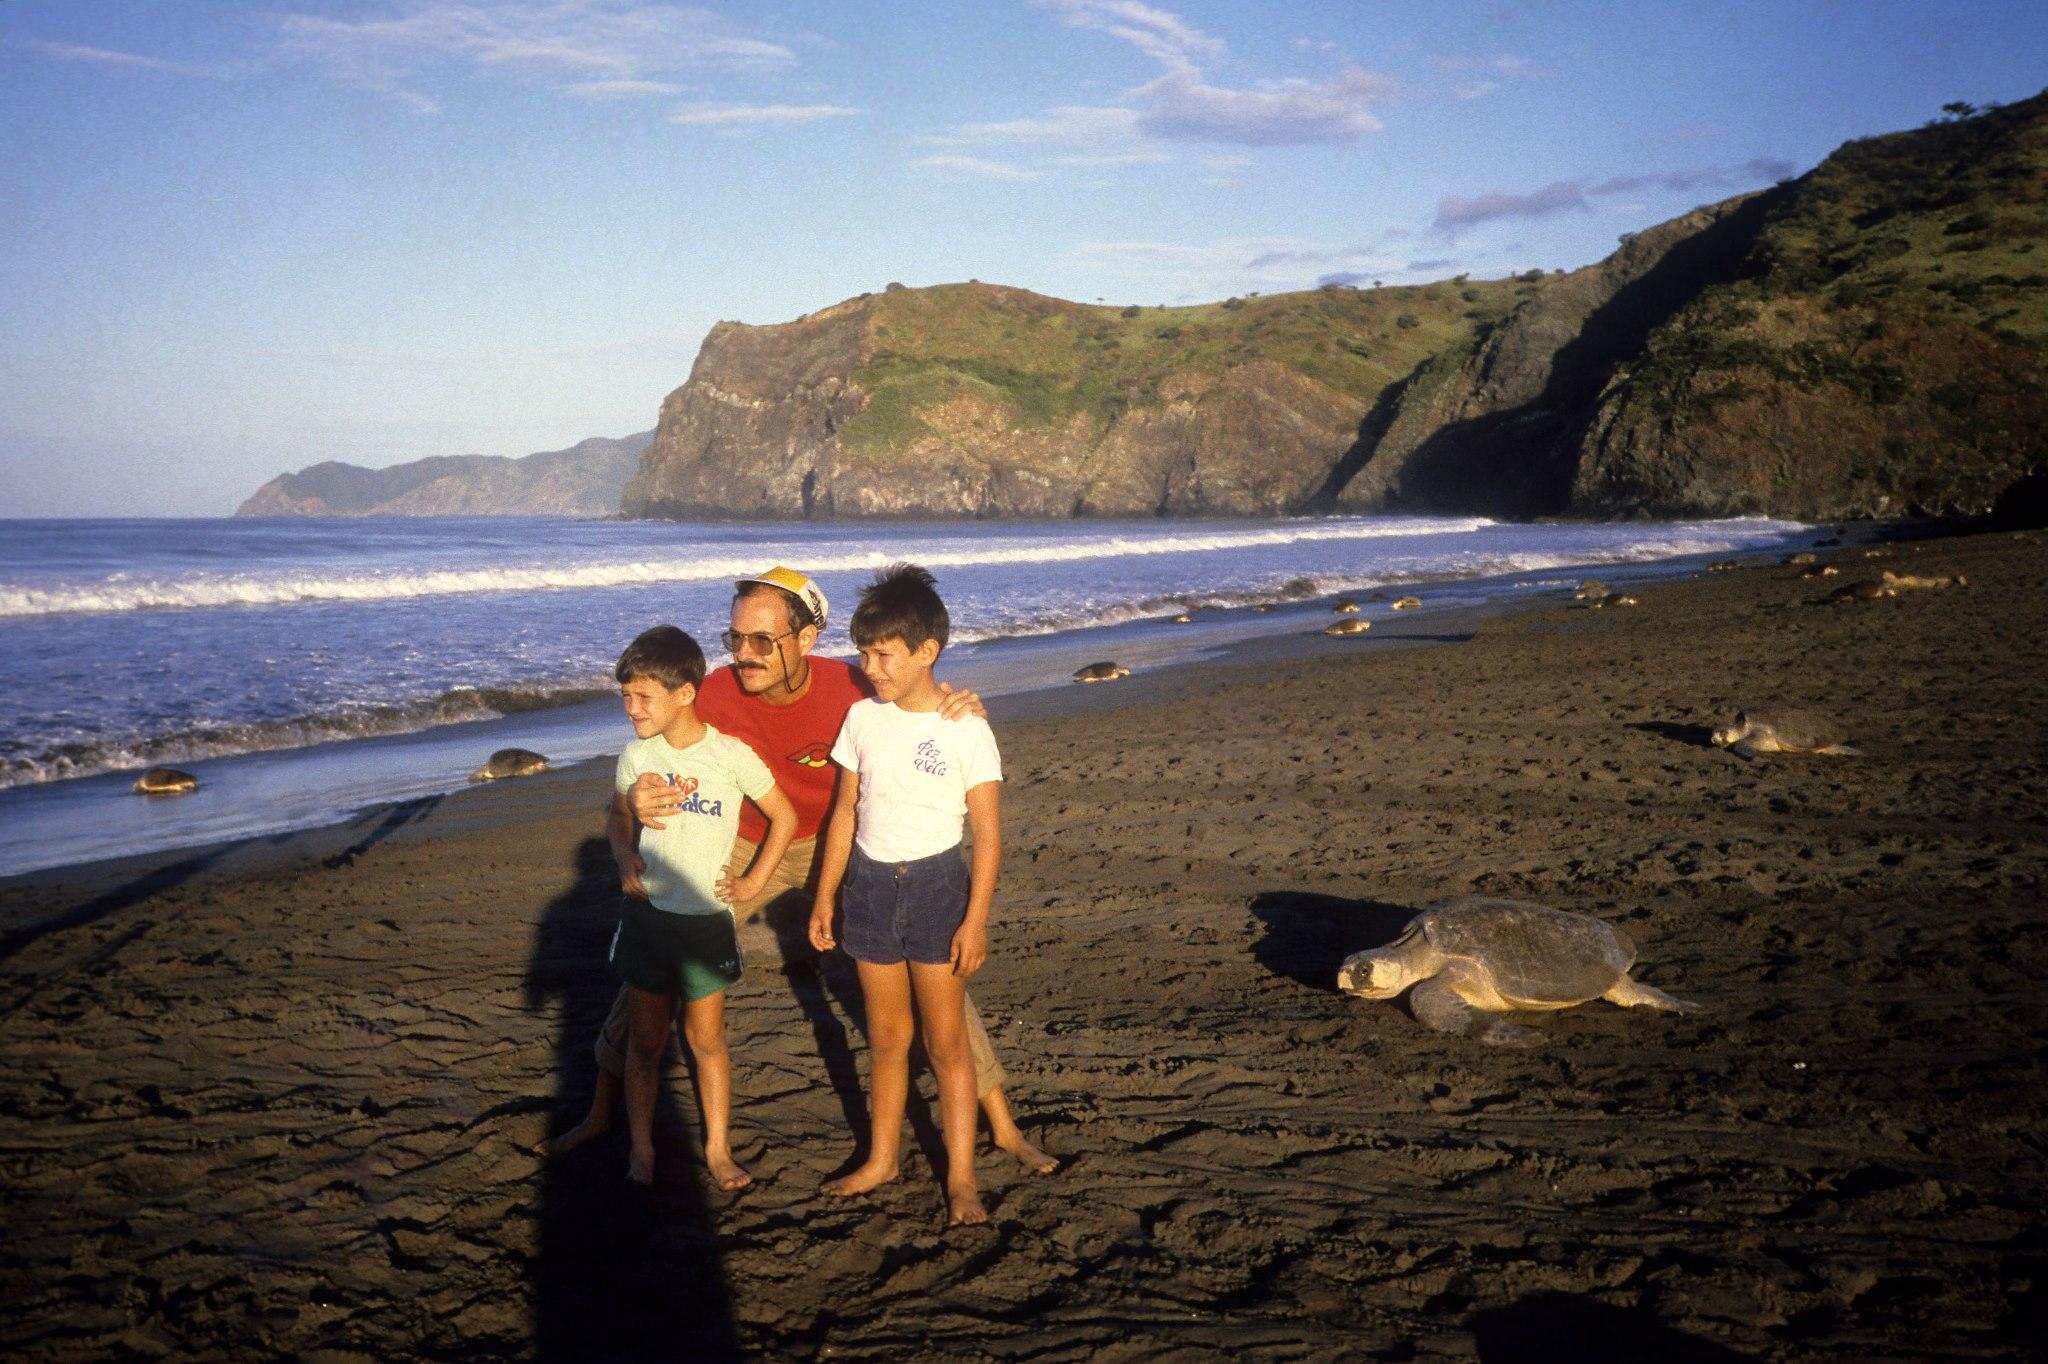 Playa Naranjo, Santa Rosa National Park, 1987. Arribada, hundreds of turtles nesting in sync.